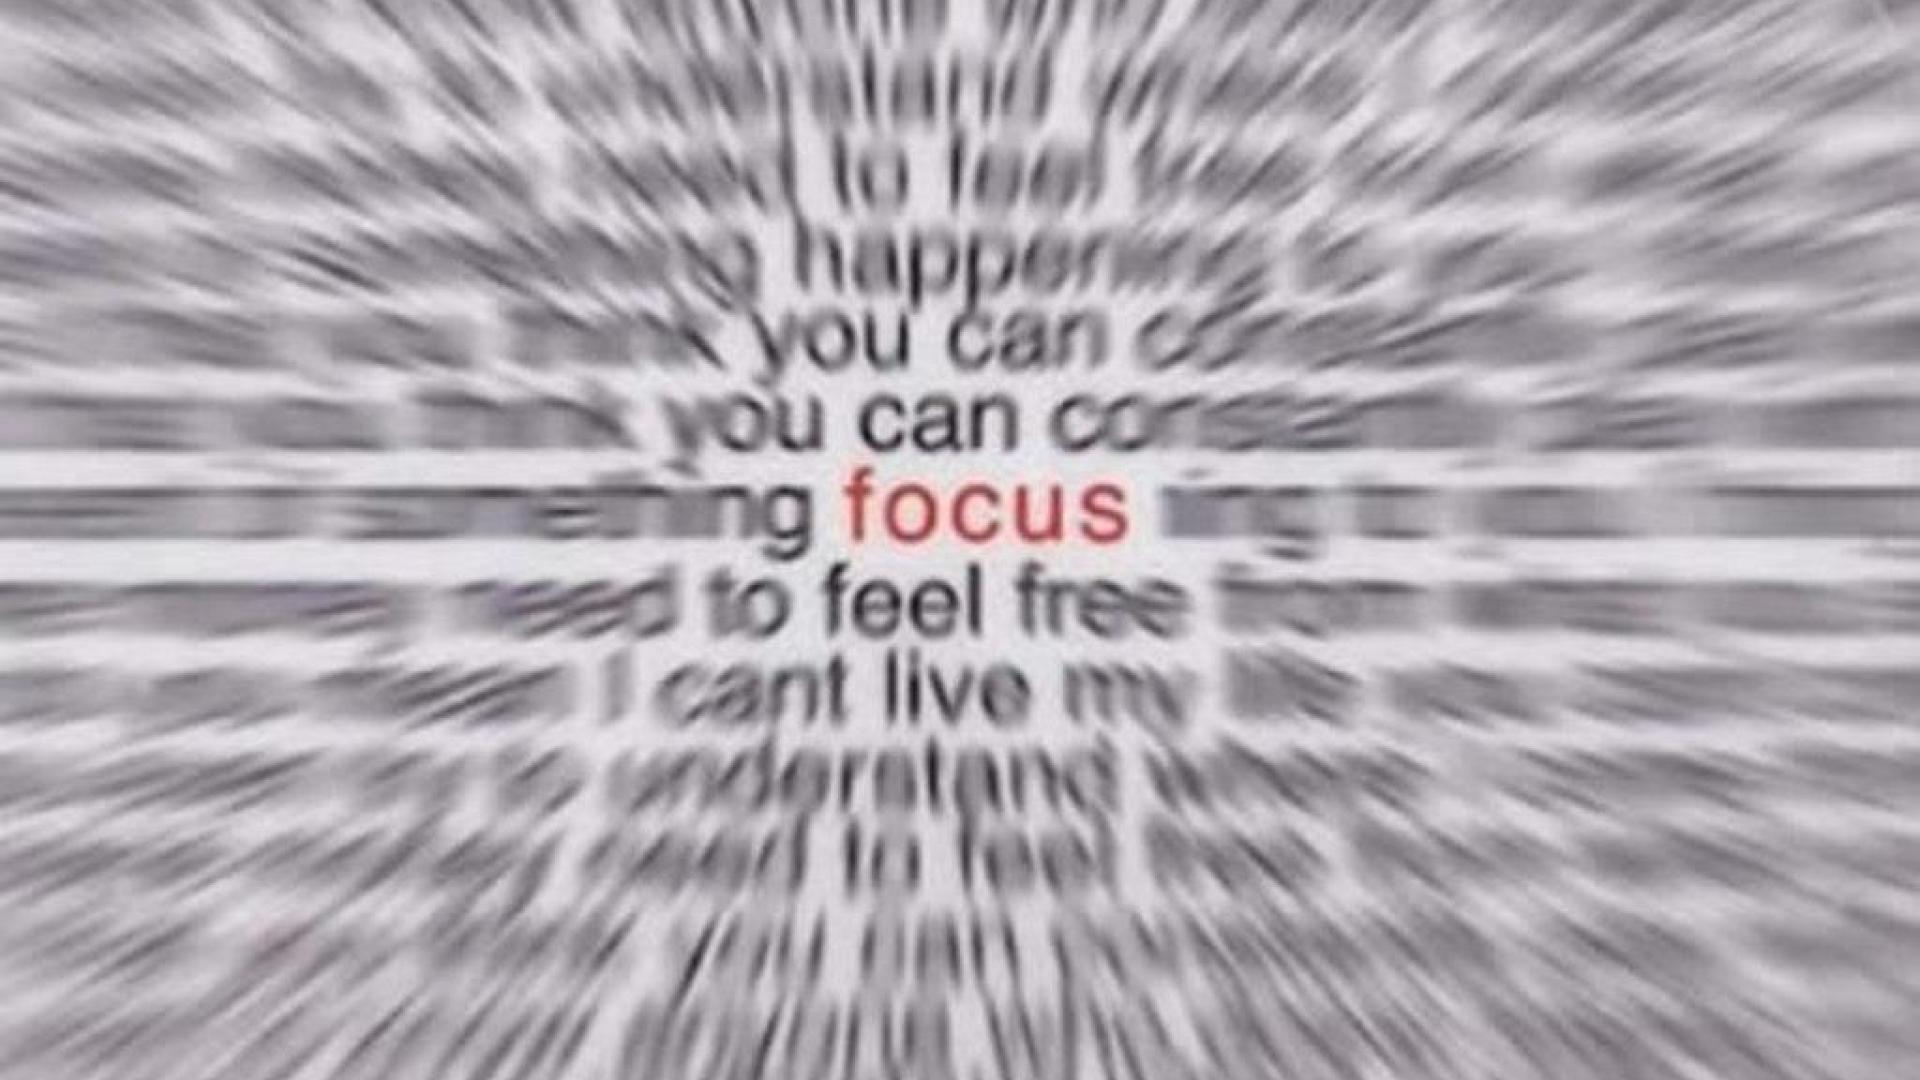 369533-focus-wallpaper-free-download